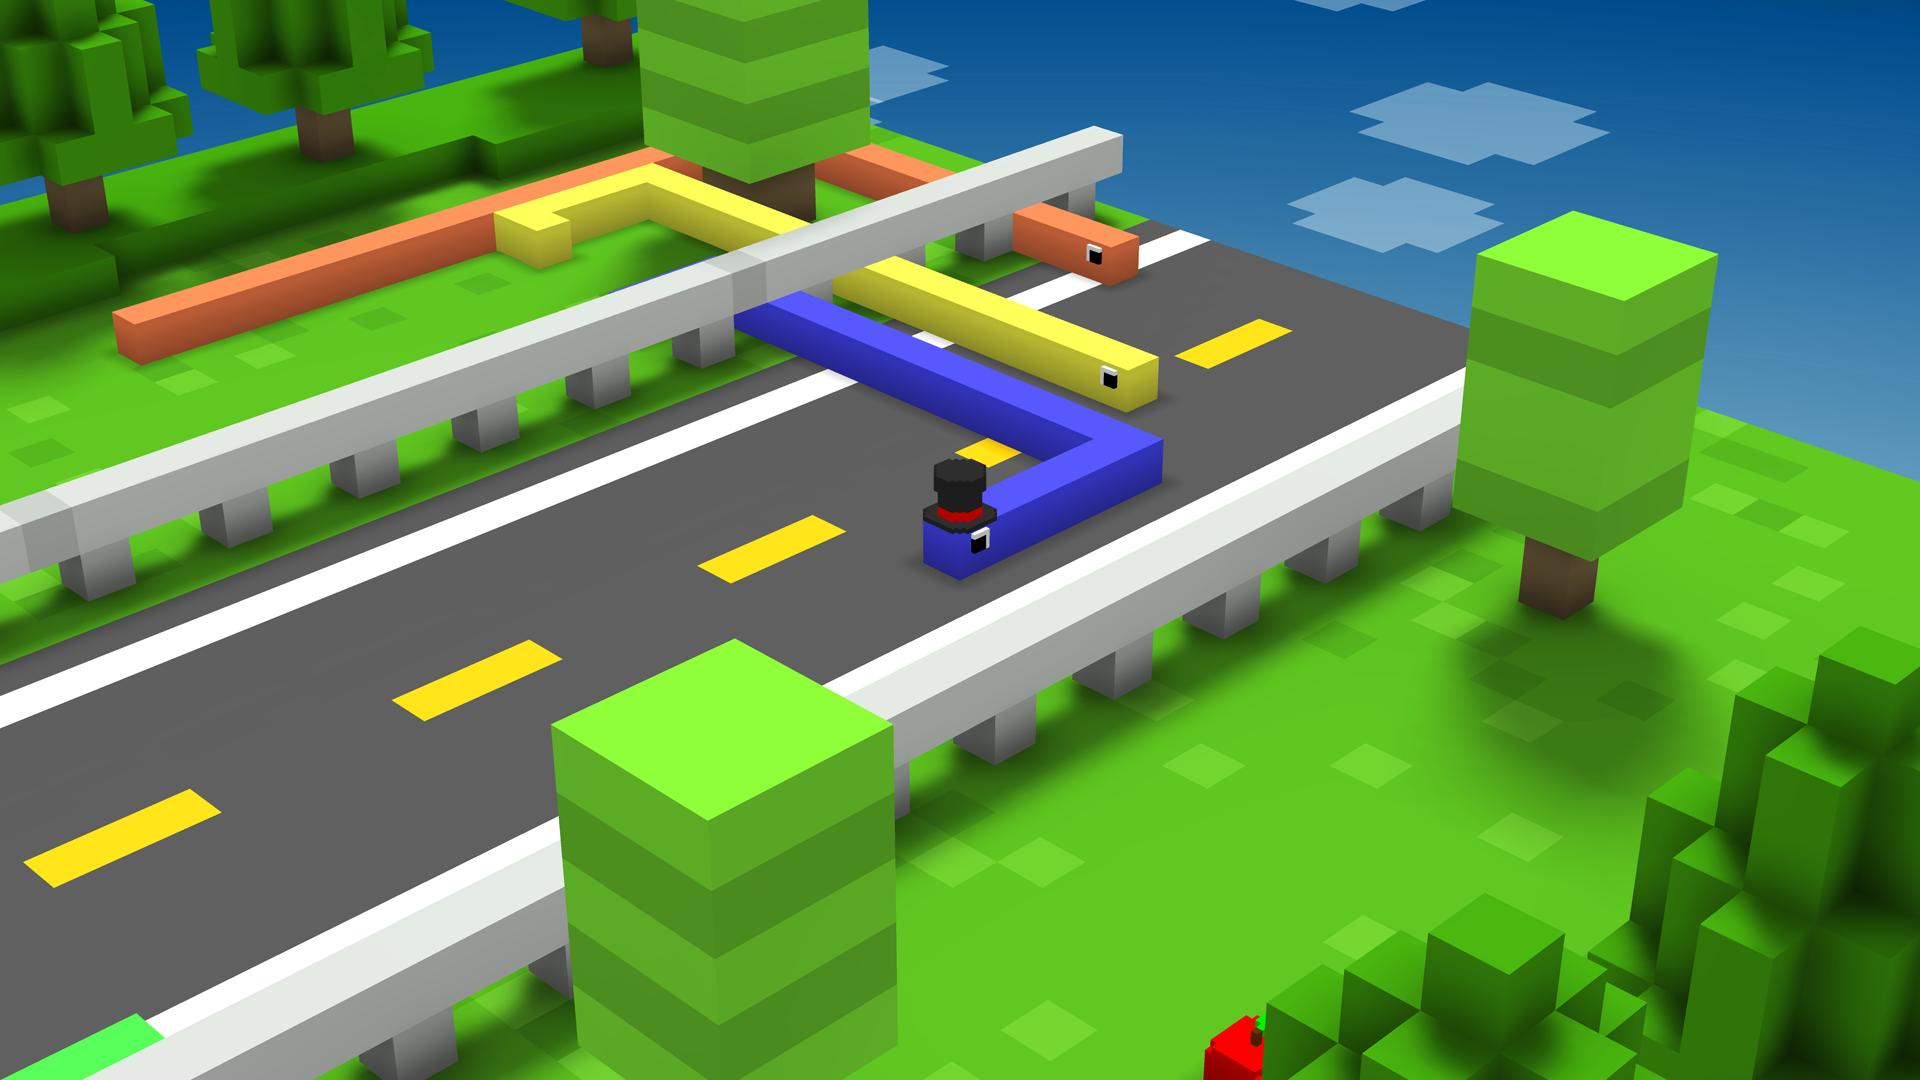 Risky Highway